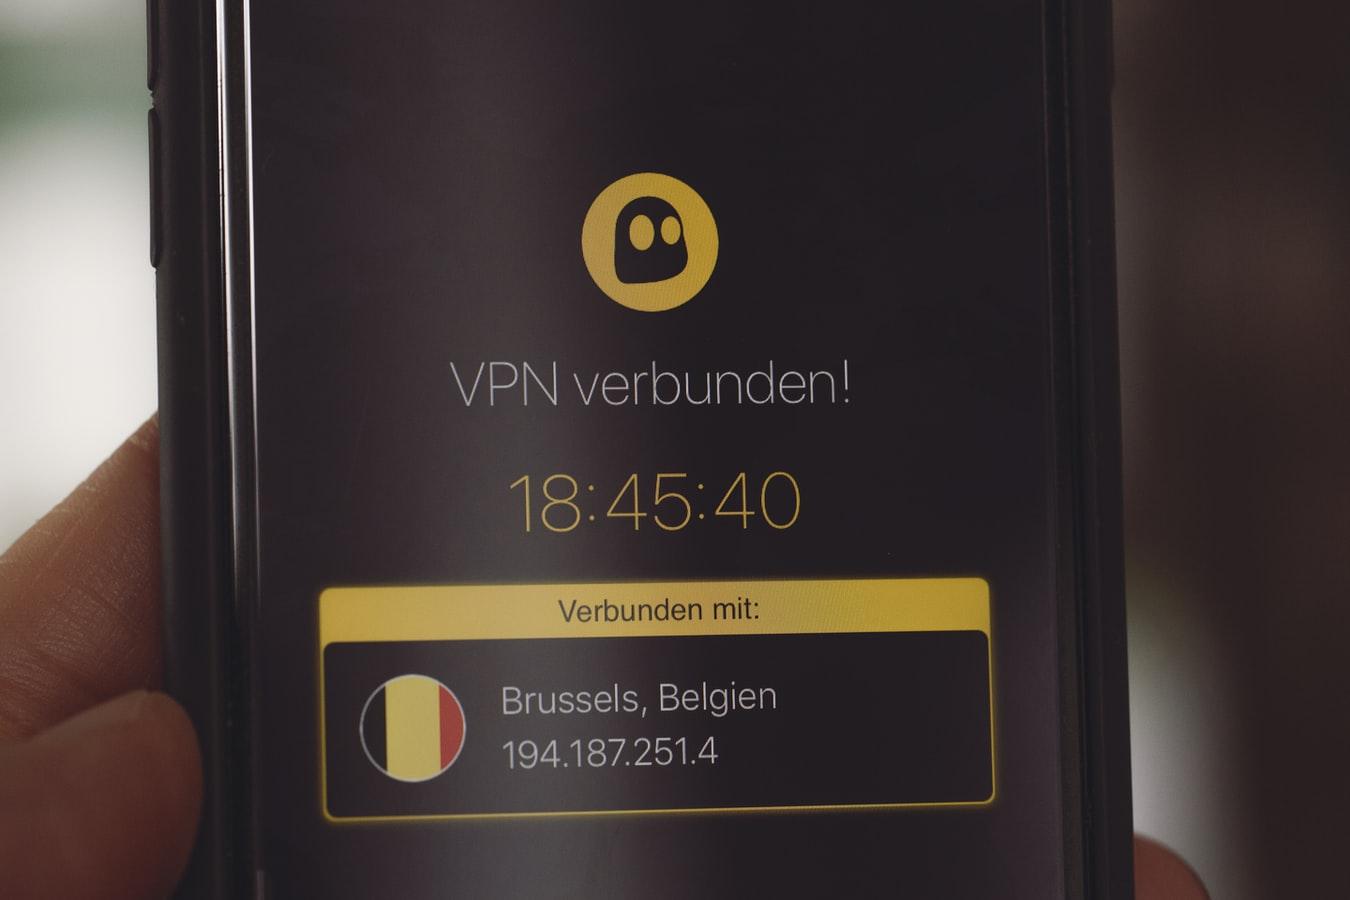 VPN δίκτυα: Τι είναι και γιατί μας είναι πλέον απαραίτητα